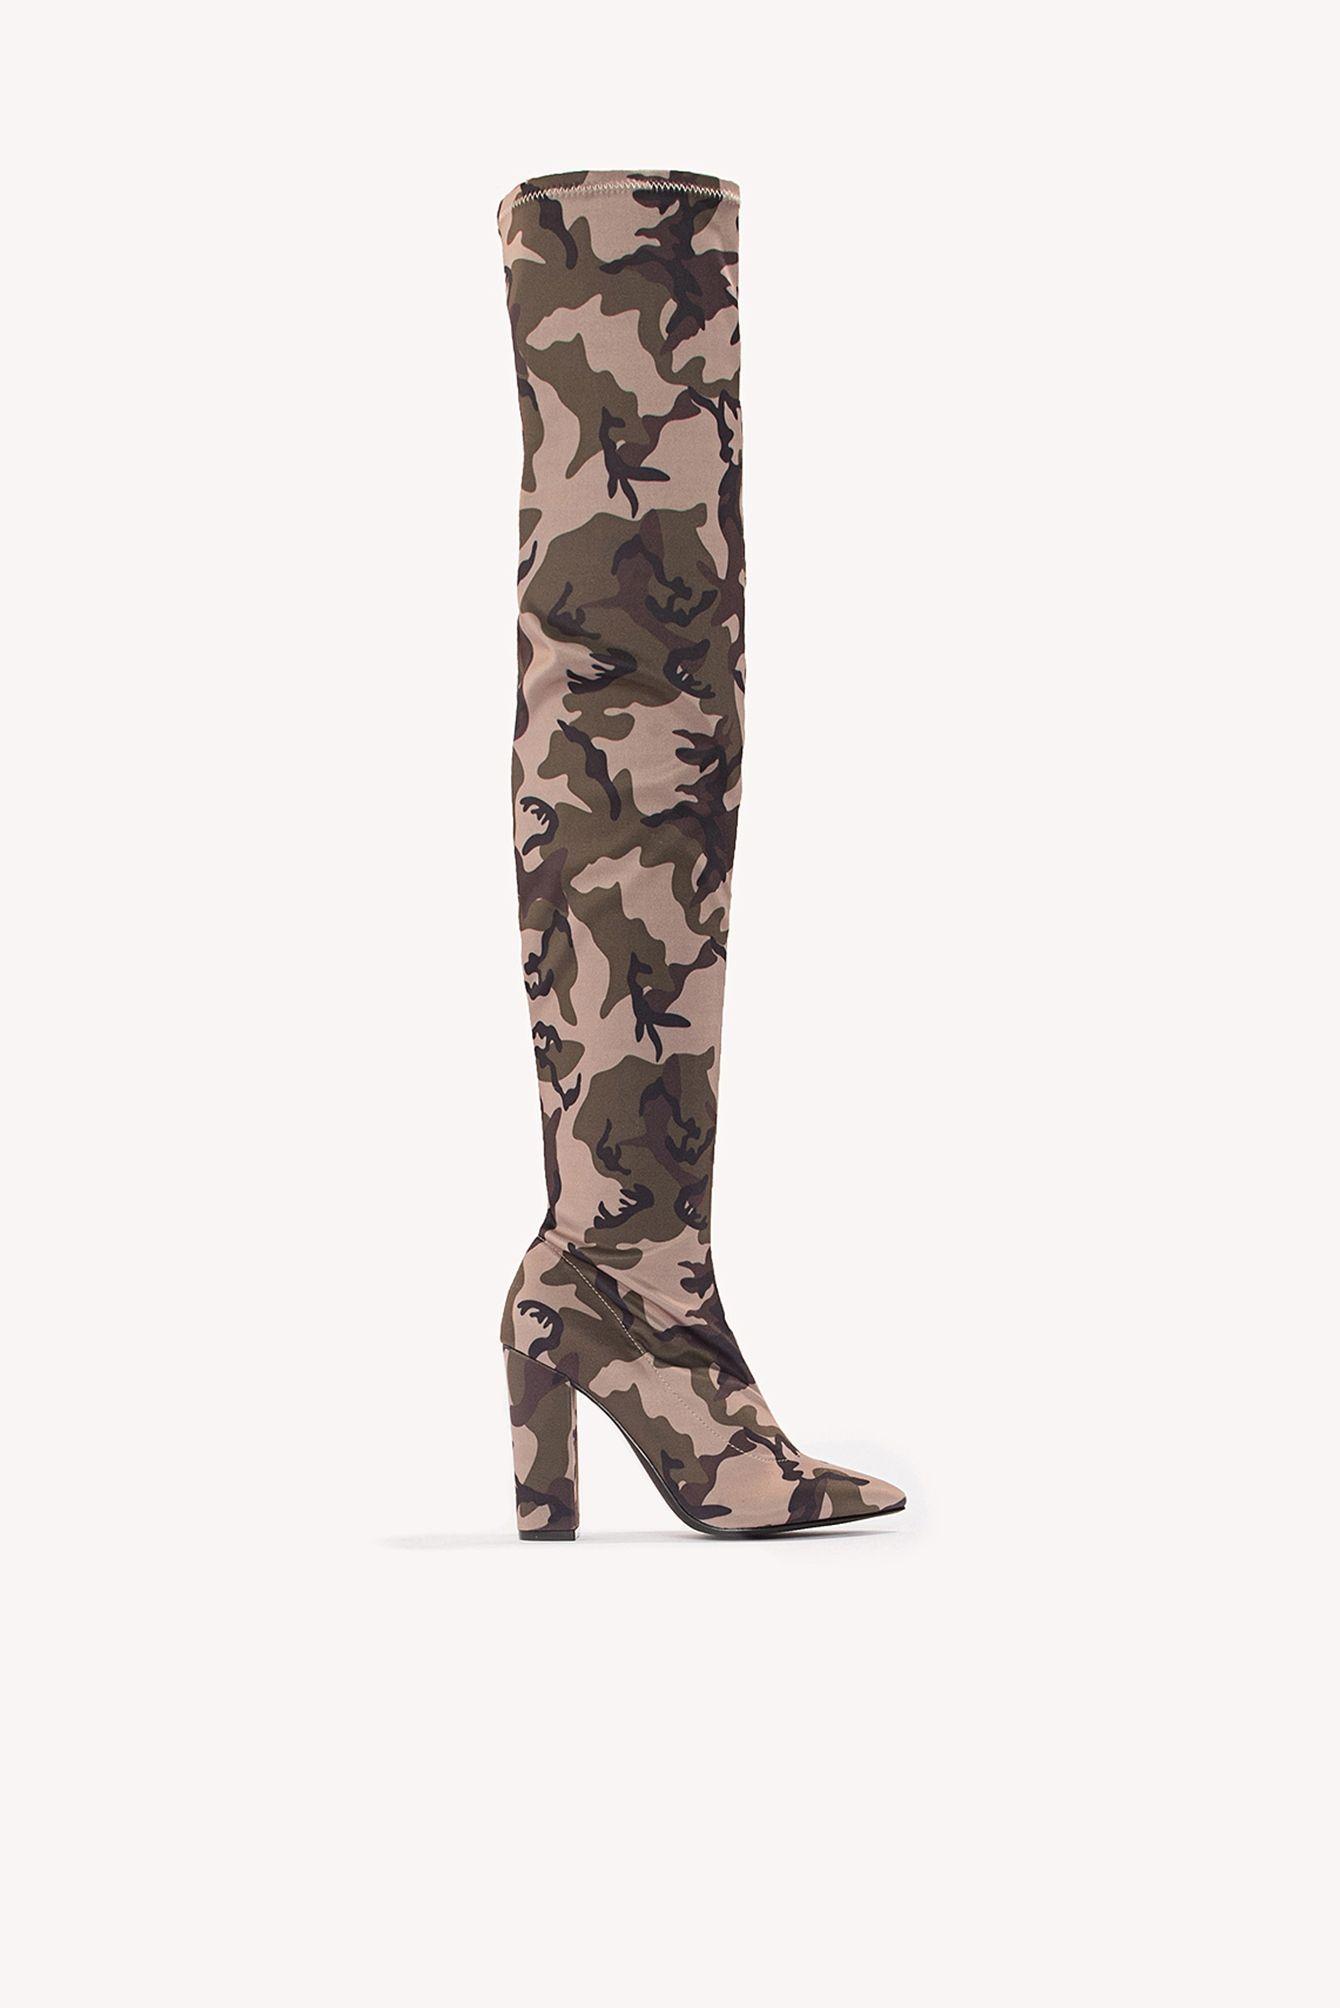 detailing 57681 5250e NA-KD SHOES   Over Knee Camo Boot  Shoes  NA-KD SHOES